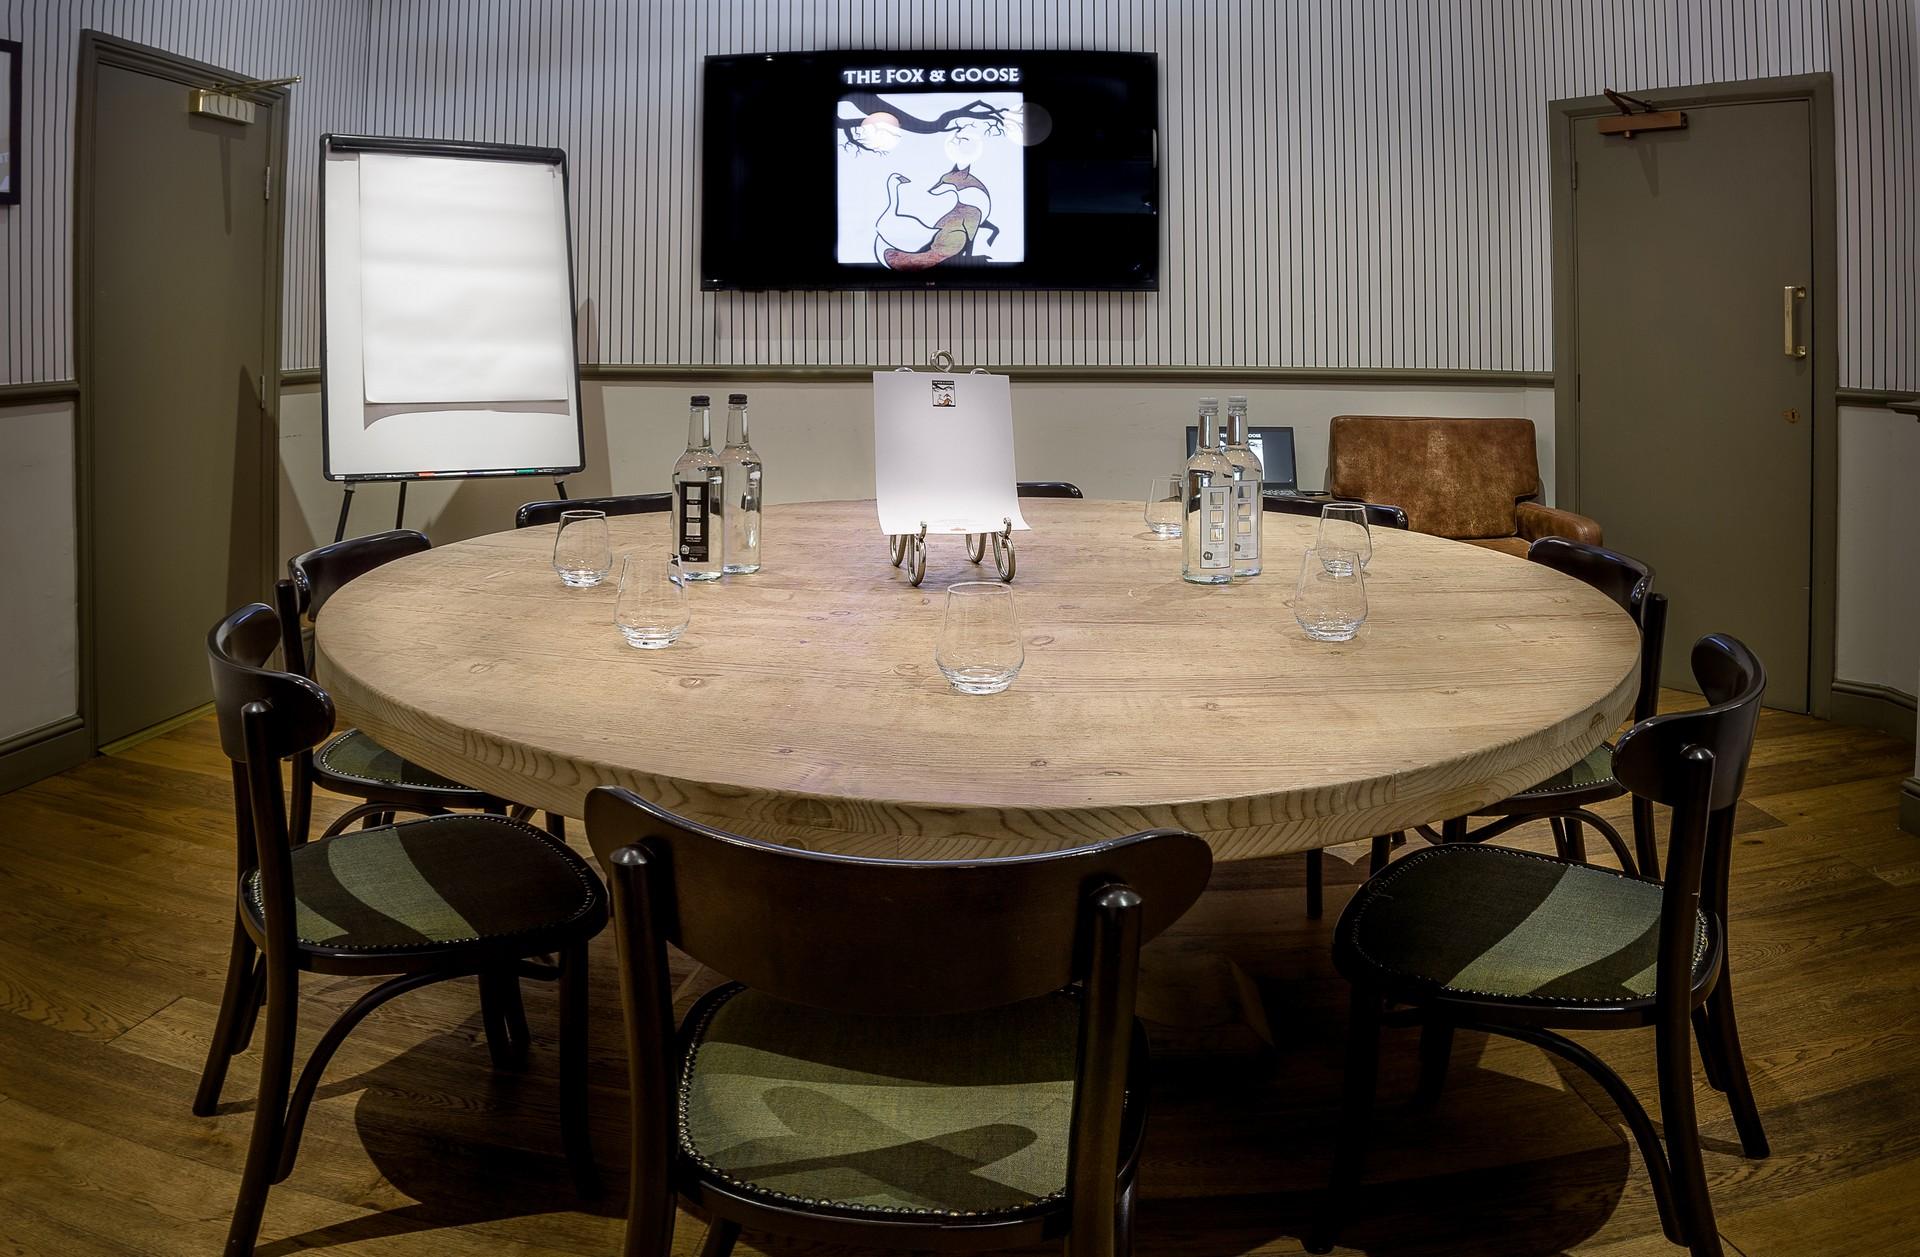 Parlour room meeting 2